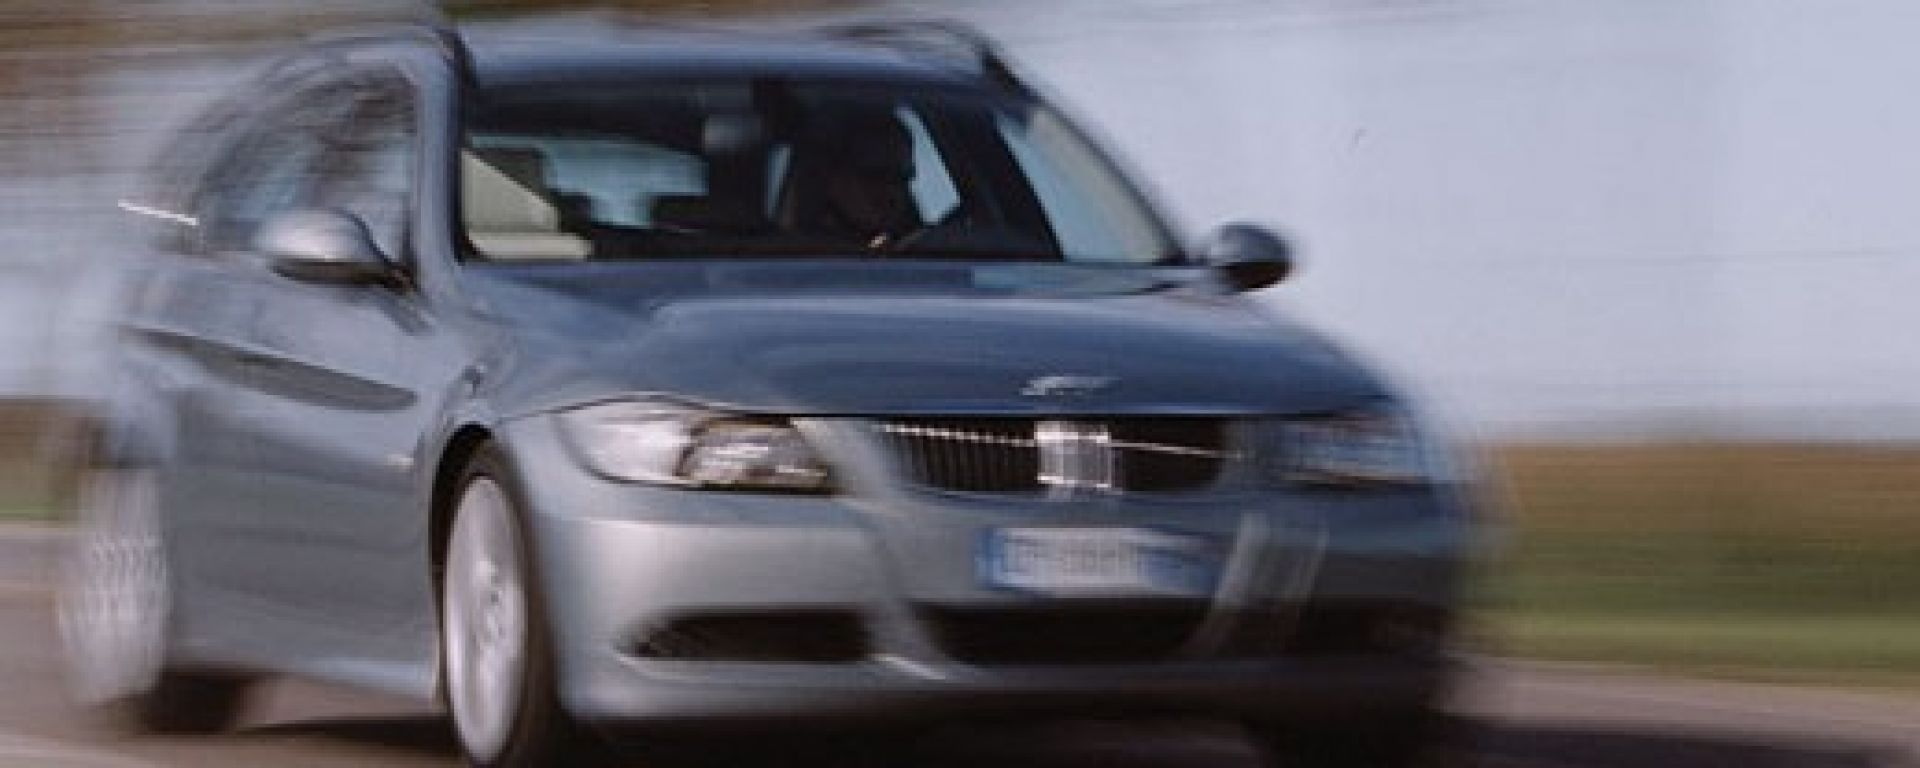 Bmw Serie 3 Touring 2005